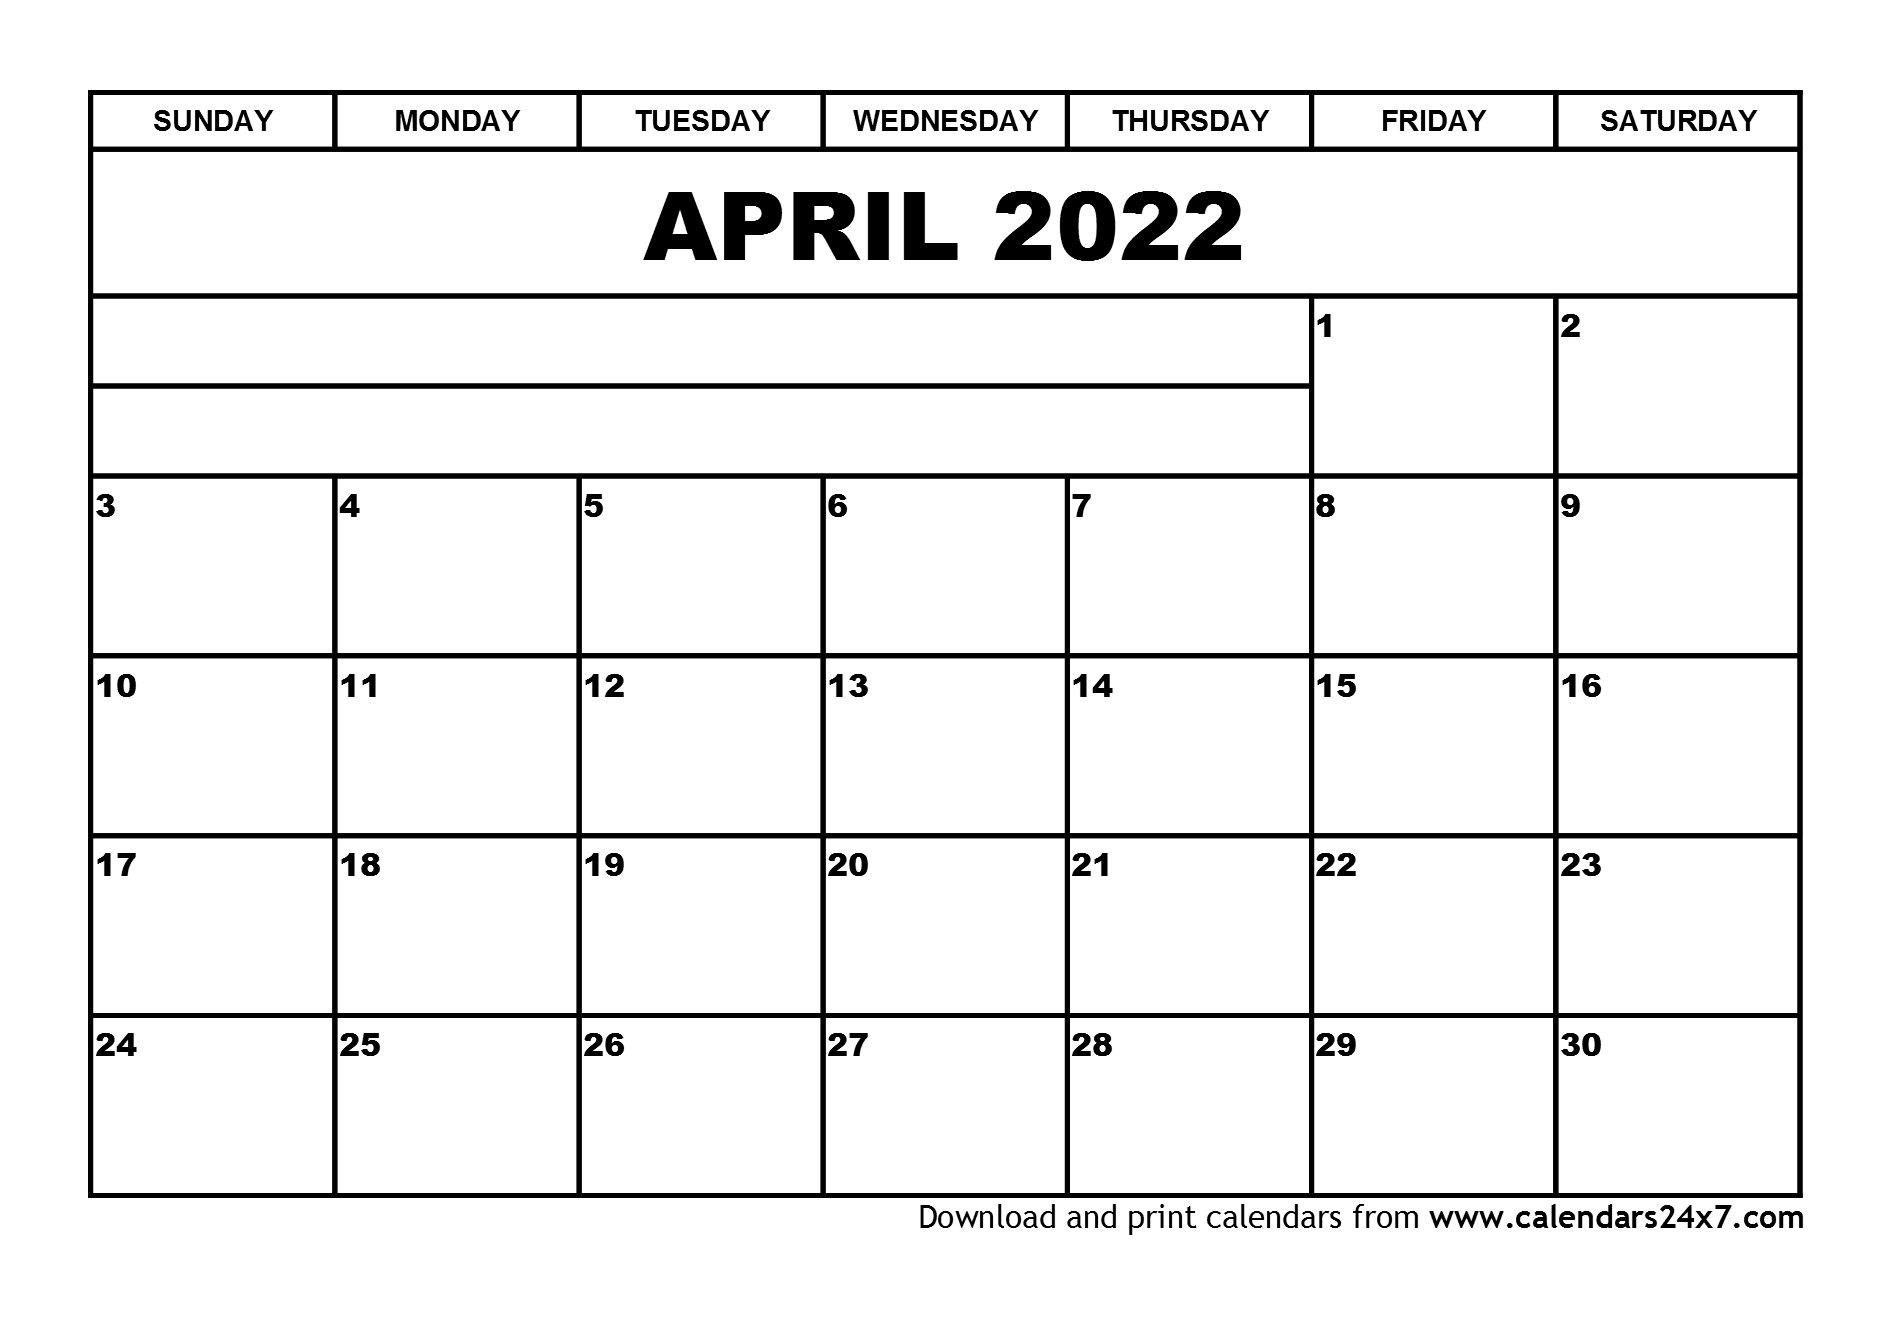 April 2022 Calendar & May 2022 Calendar Within March And April 2022 Calendar Free Printable